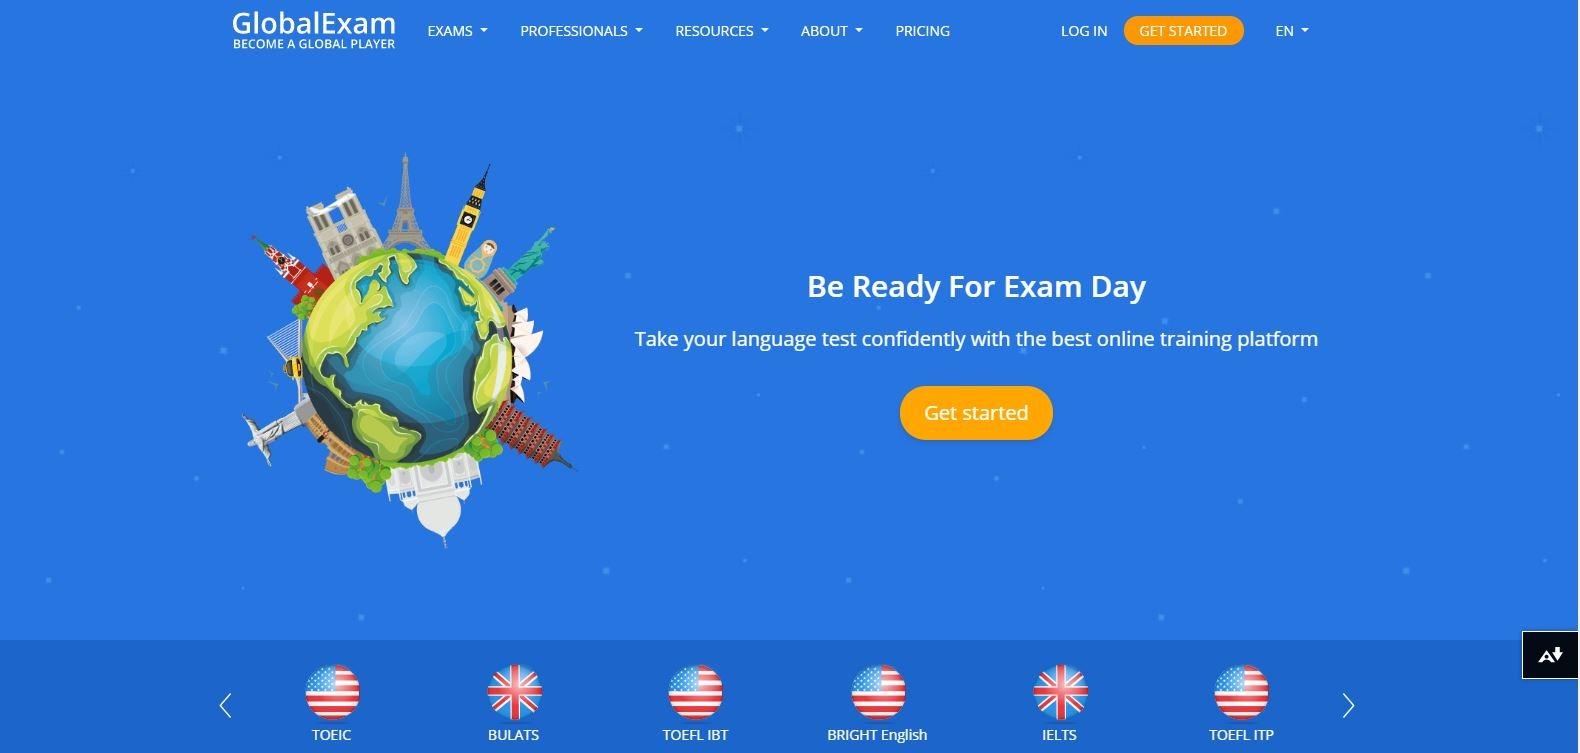 Globalexam (آزمون جهانی) یکی از منابع آزمون اف سی ای